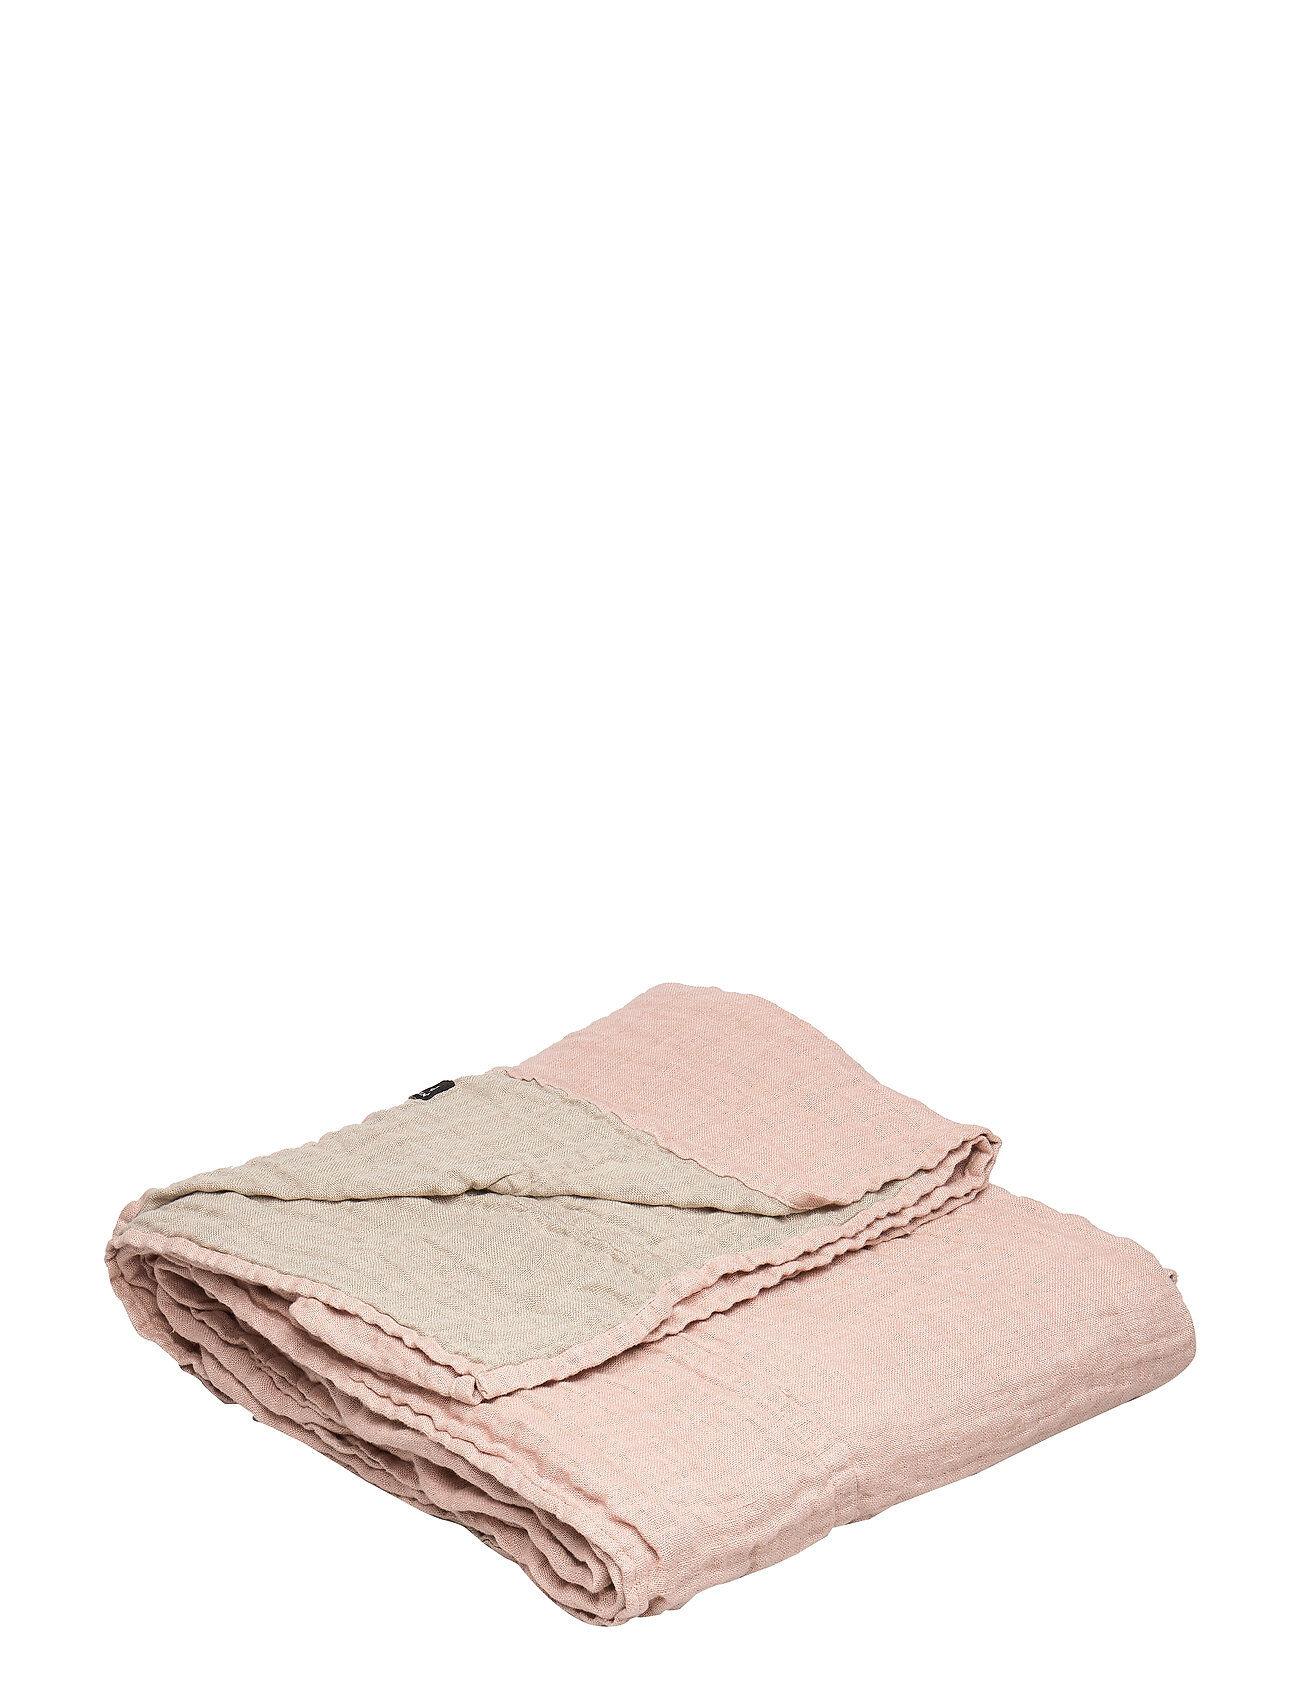 Himla Hannelin Bedspread Home Bedroom Bedspread Vaaleanpunainen Himla